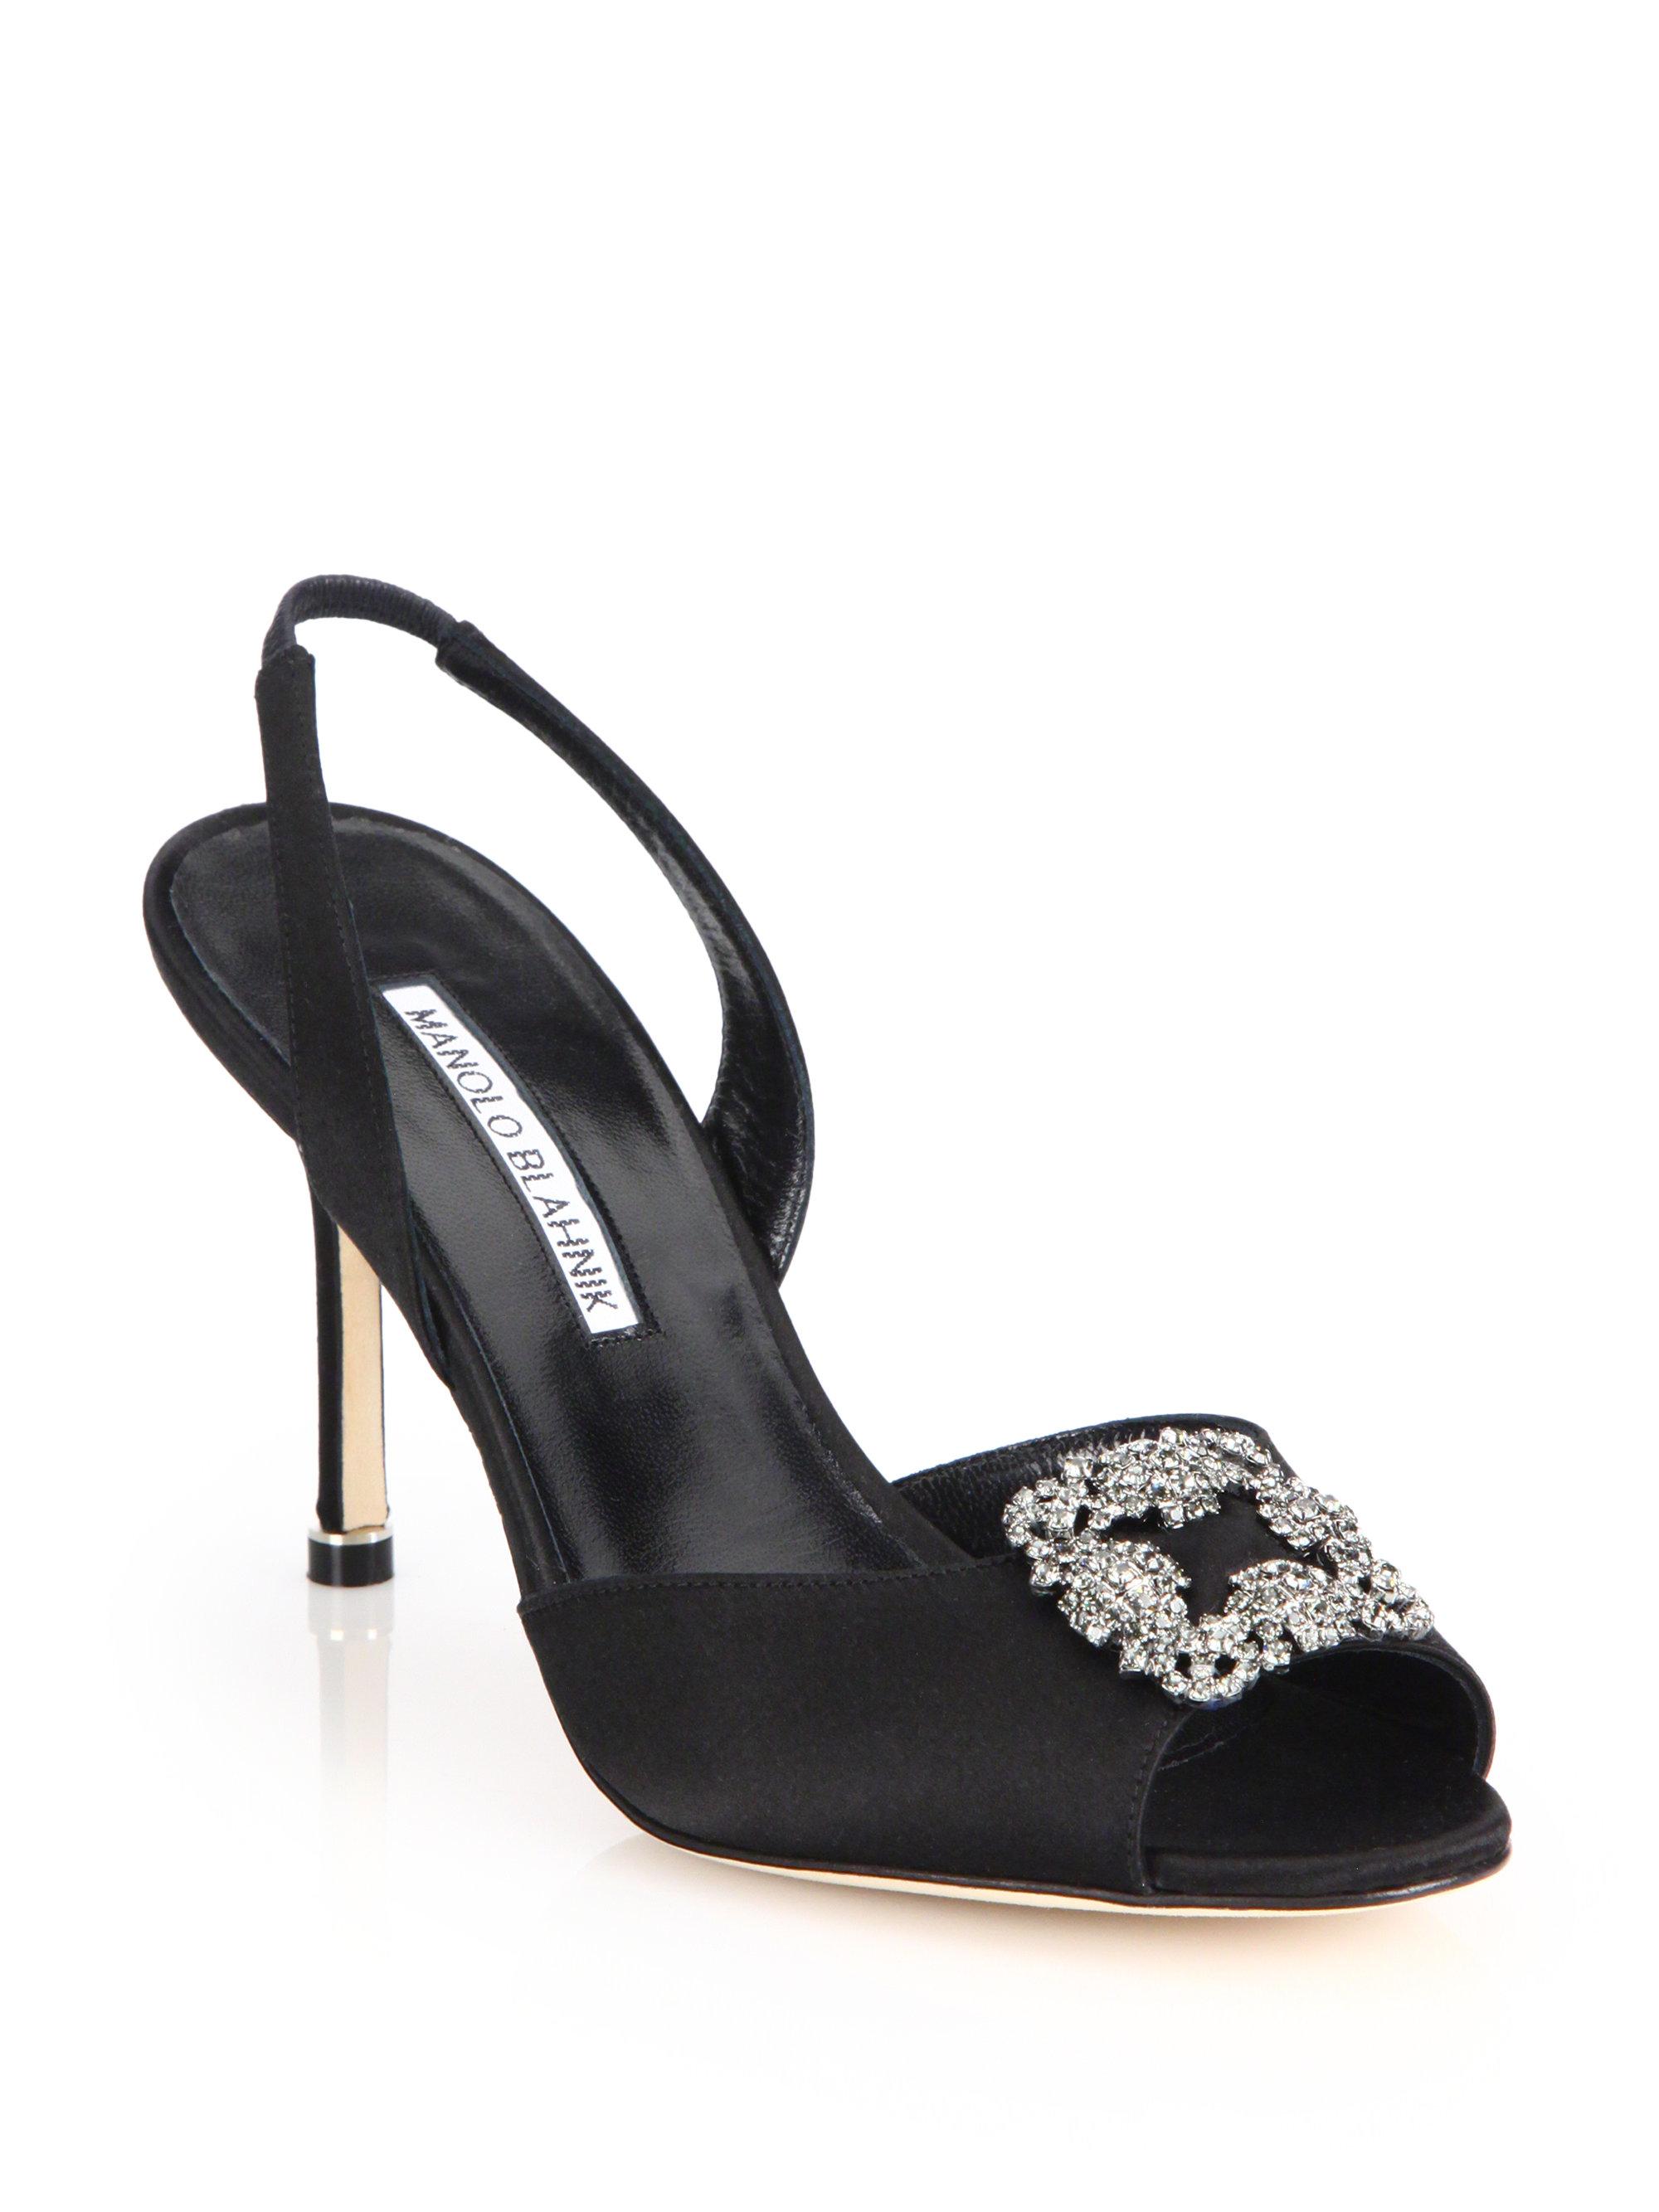 545034de87459 Lyst - Manolo Blahnik Cassia Jeweled Satin Slingback Sandals in Black